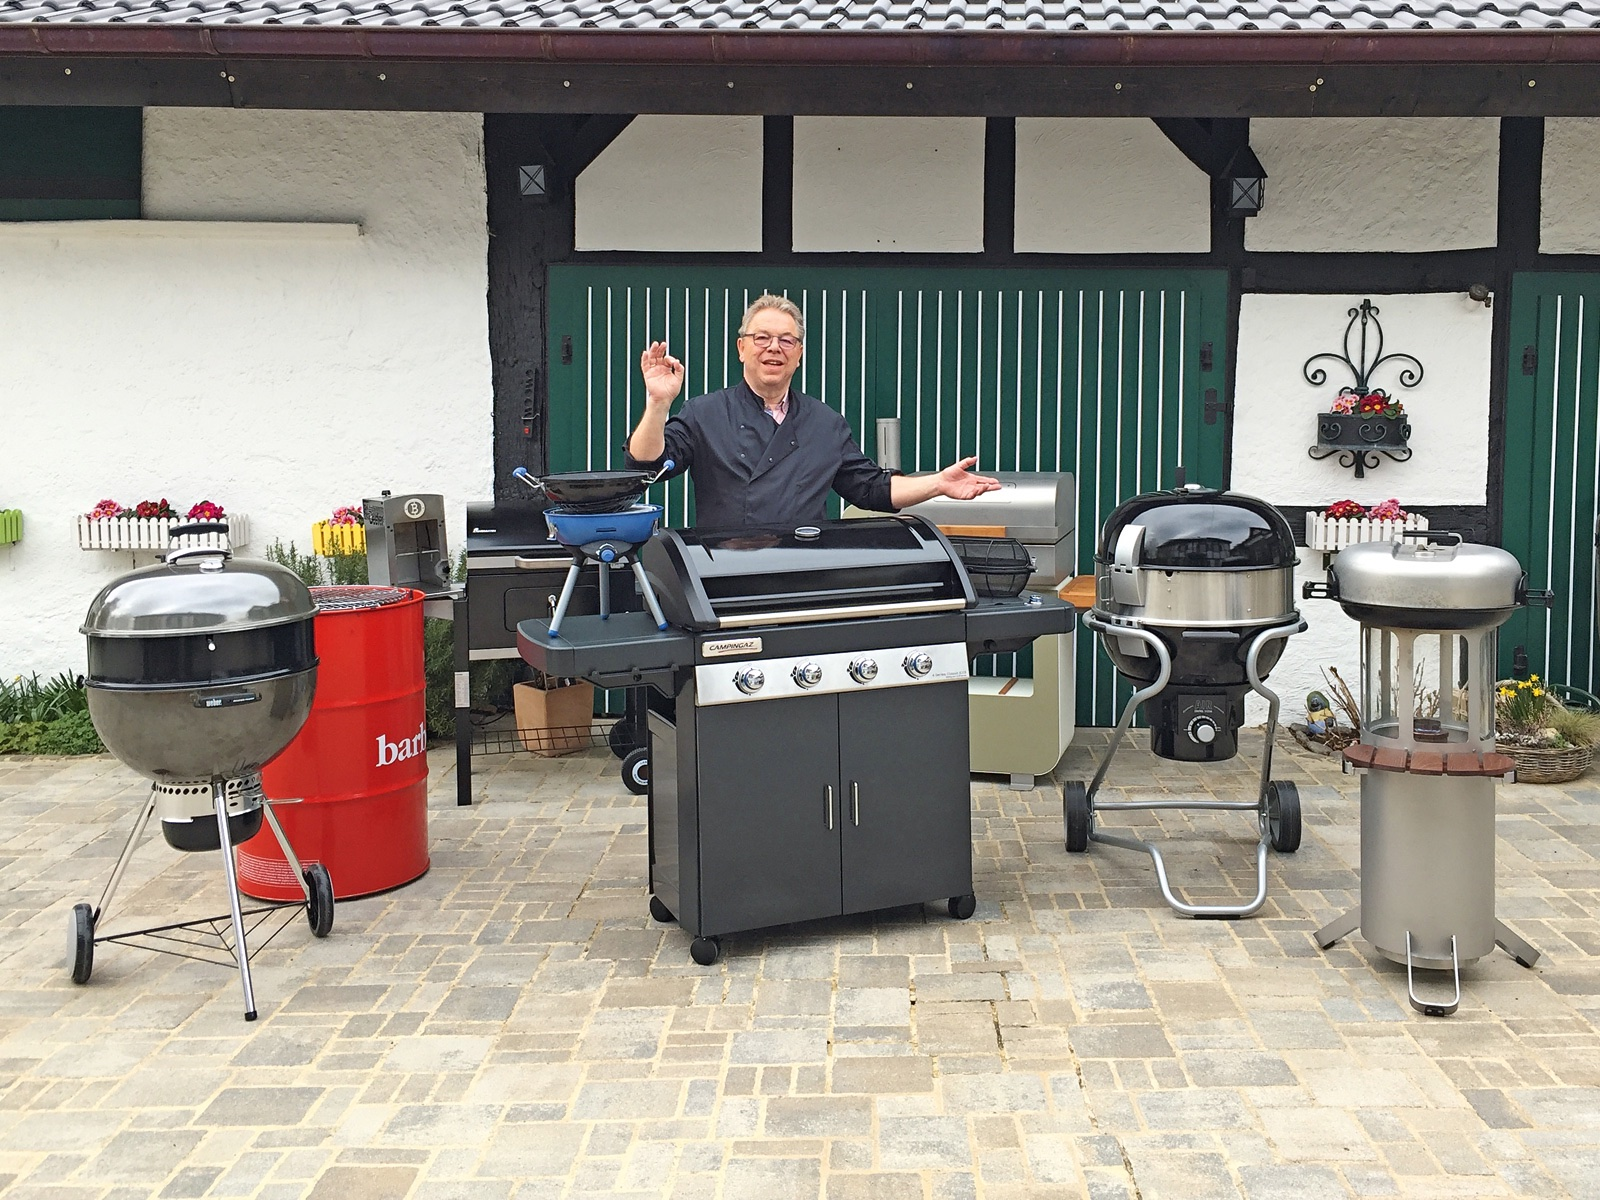 Rösle Gasgrill Jubiläum : Fug grill check 2016 altbewährtes und innovativ neues mai 2016